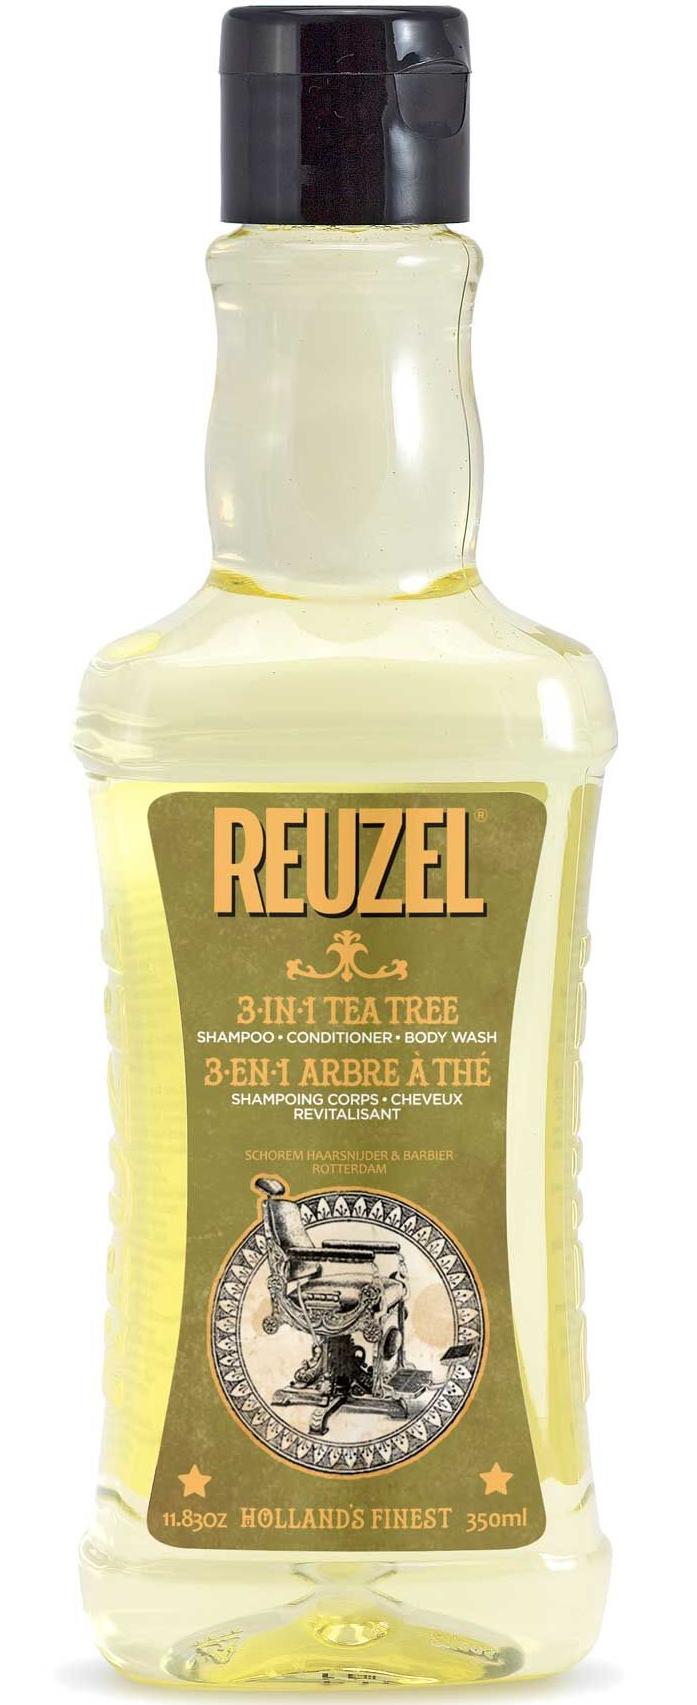 REUZEL 3-in-1 Tea Tree Shampoo-Conditioner-Body Wash 11.83oz/350ml